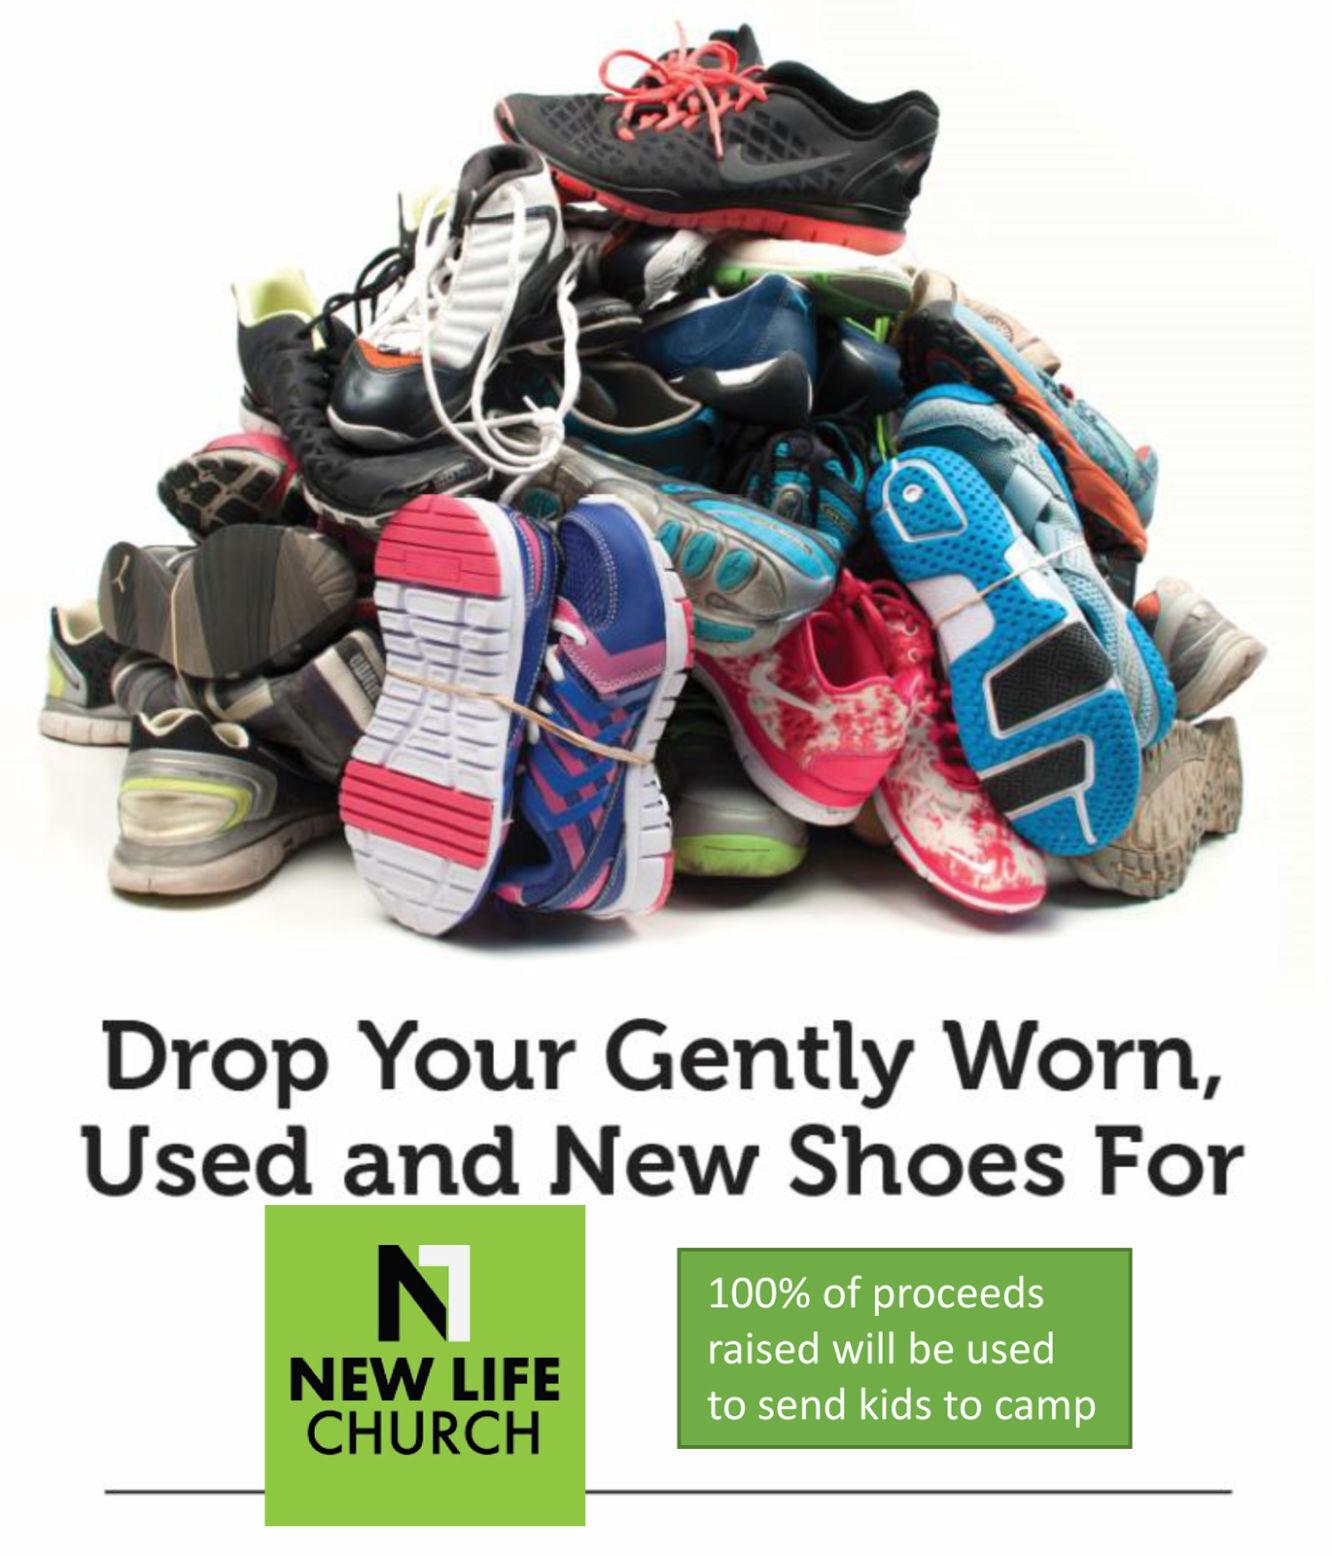 New Life Church Launches Shoe Drive Fund-raiser